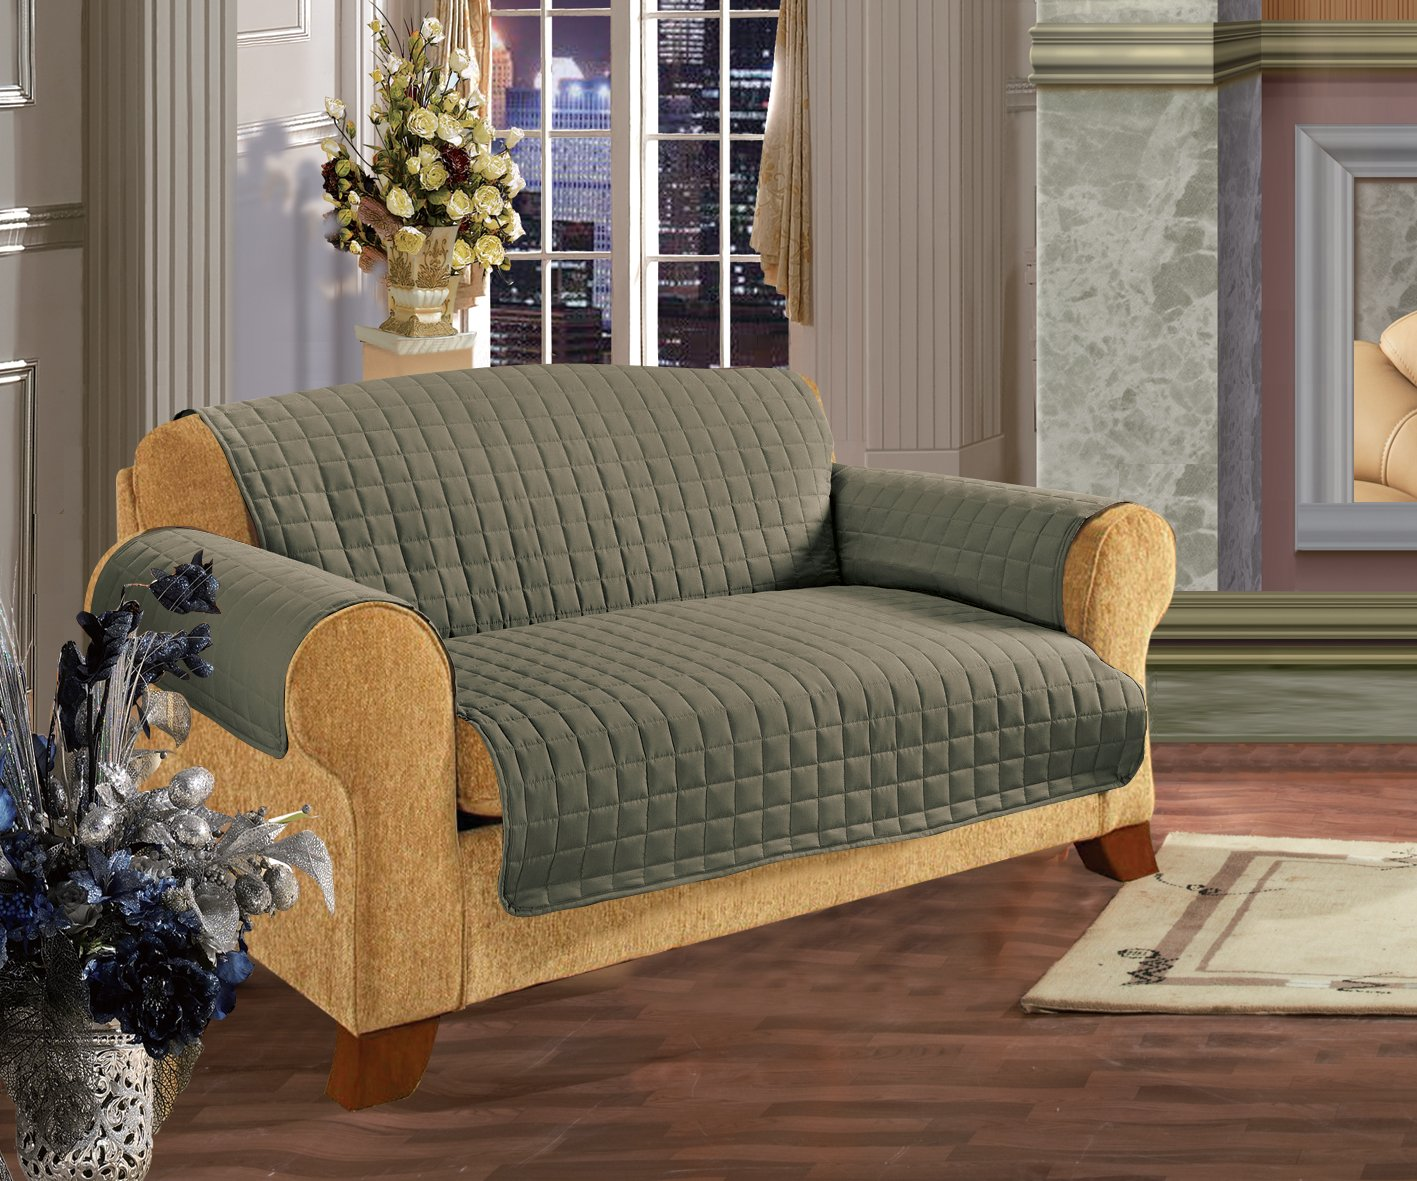 Elegance Linen Quilted Pet Dog Children Kids Furniture Protector Microfiber Slip Cover Sofa, Green Leeber Limited USA Green sofa1